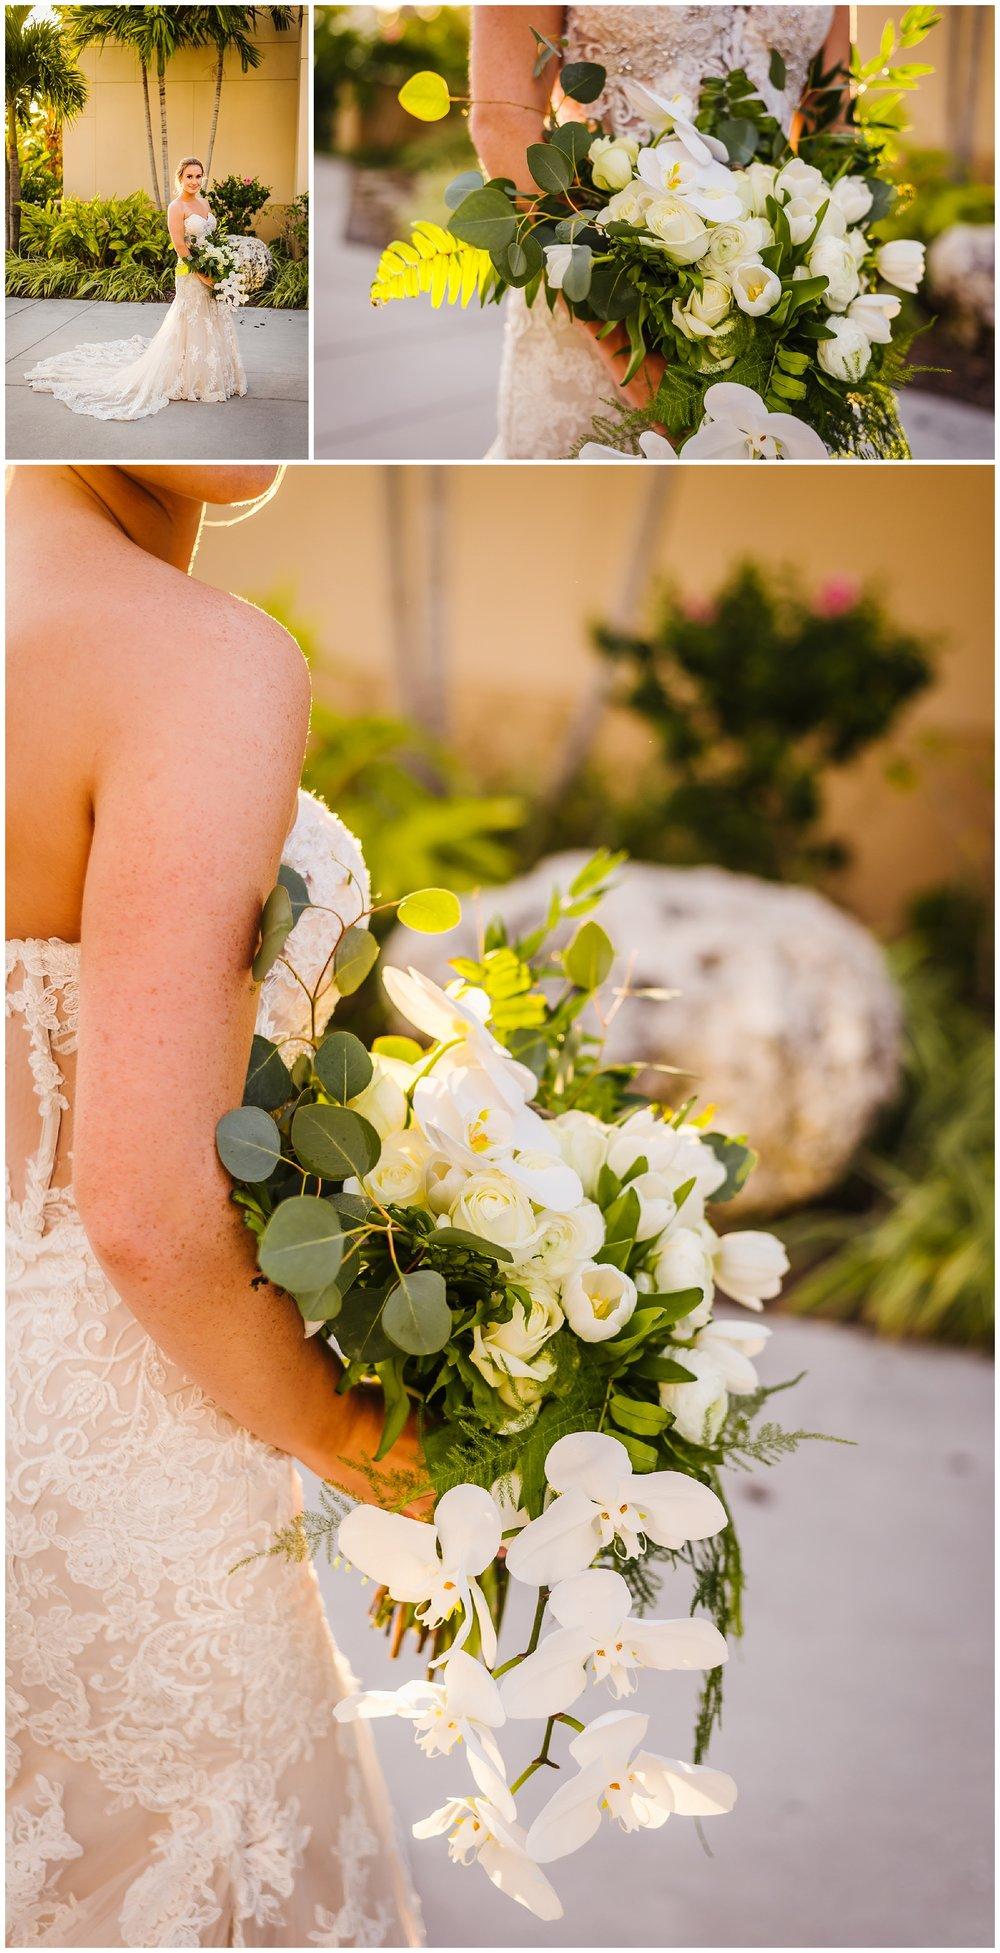 Tampa-wedding-photographer-bella-fleur-orchid-boquet-rsvb-events_0022.jpg